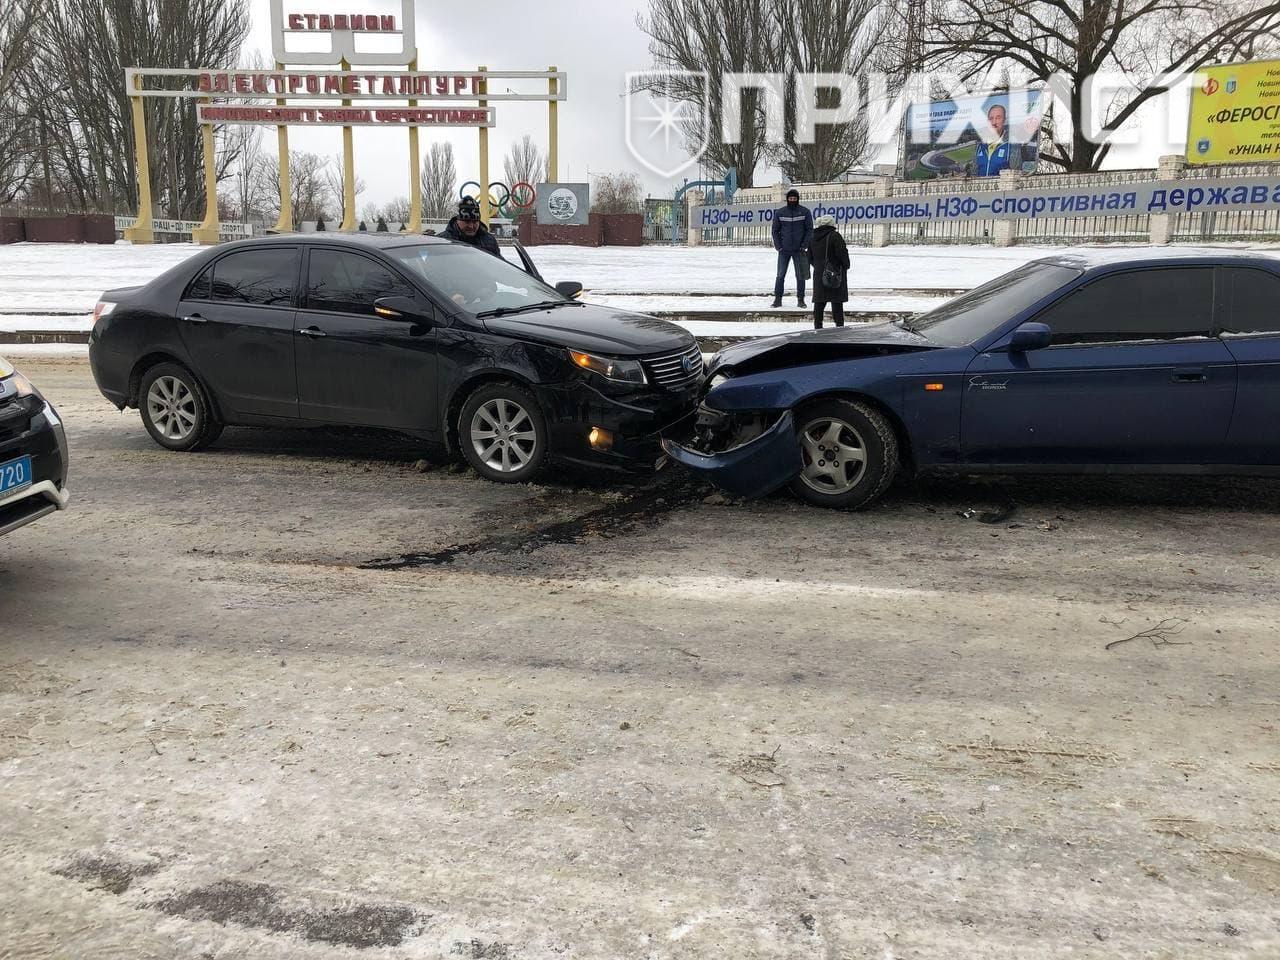 На ул. Электрометаллургов столкнулись три автомобиля и автобус | Прихист